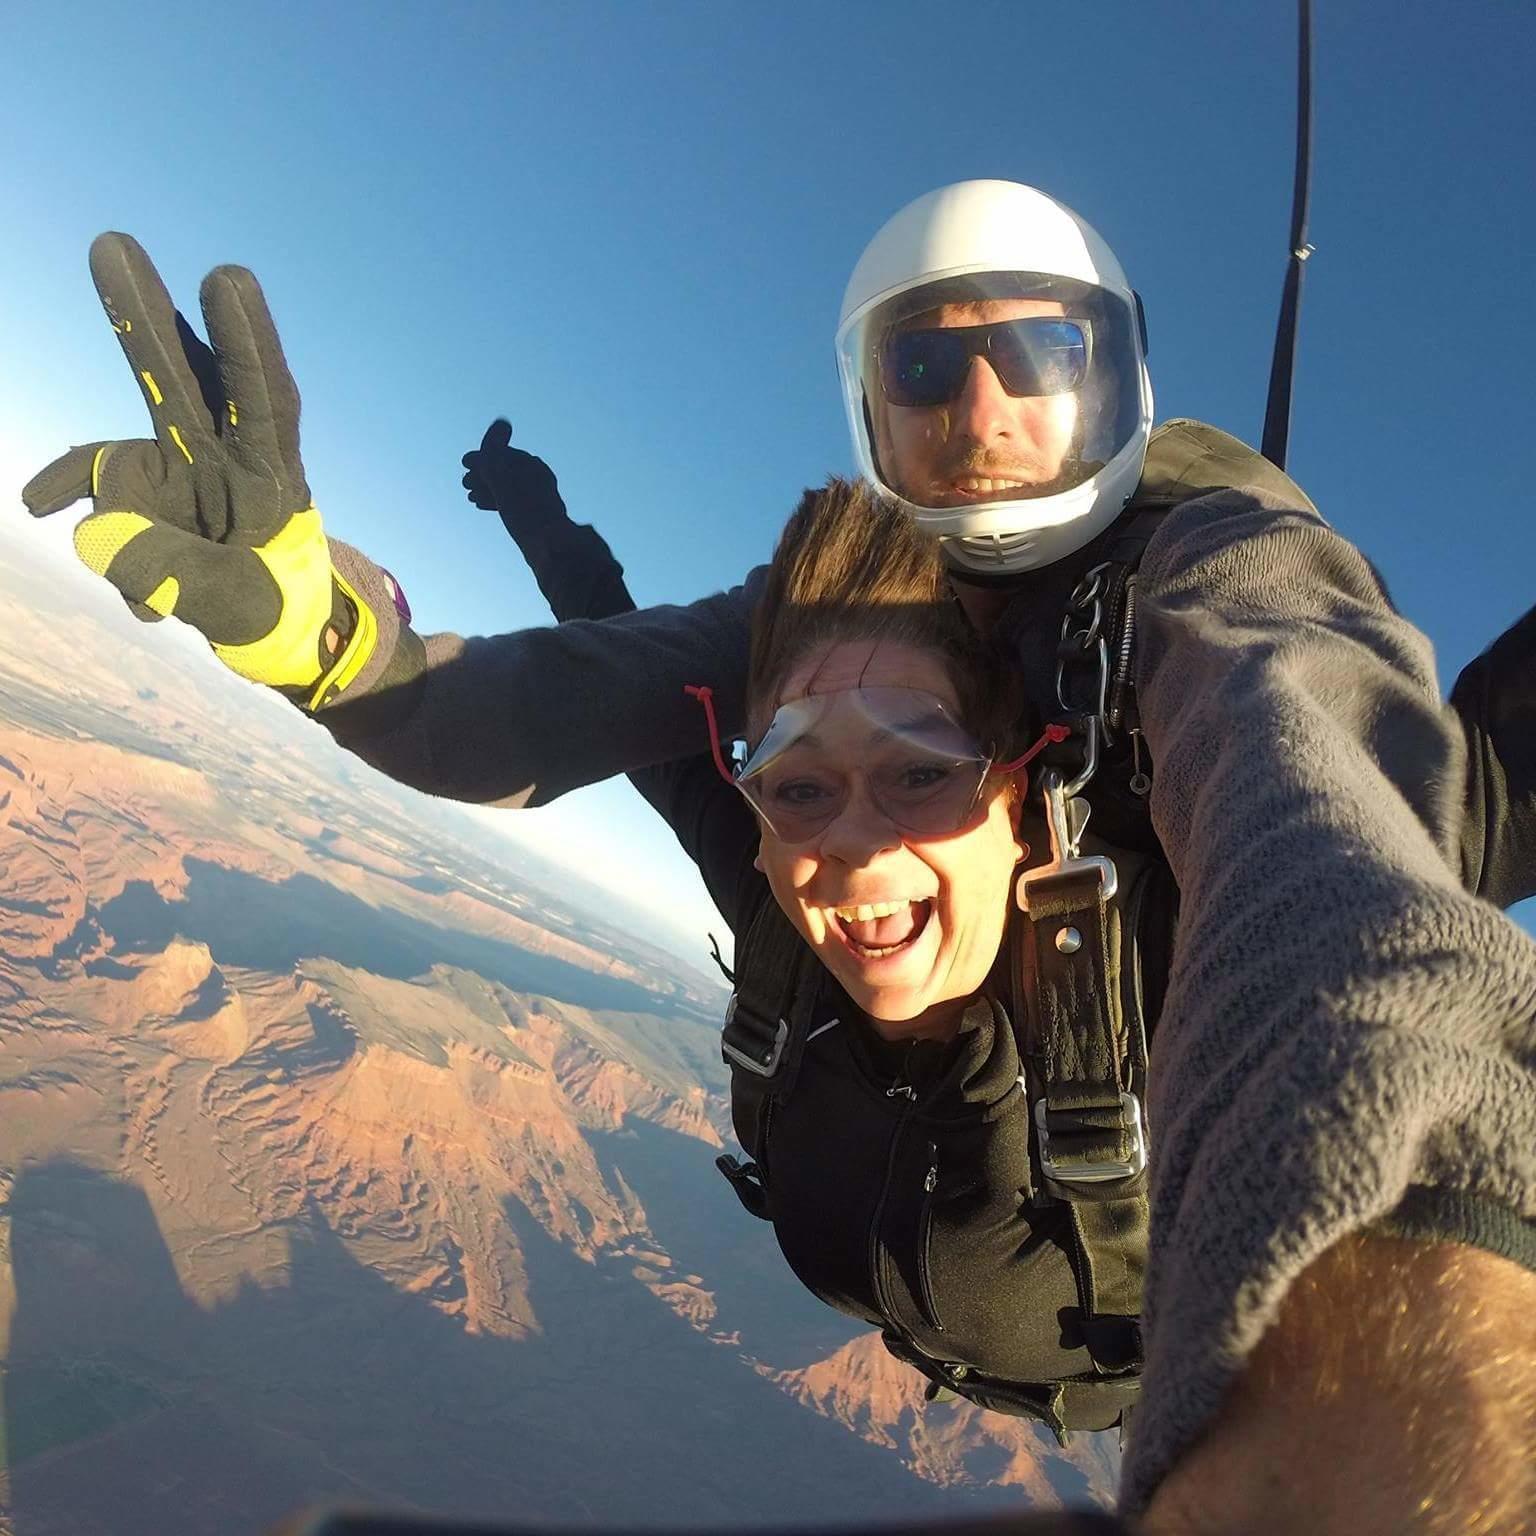 Skydive Canyonlands image 5